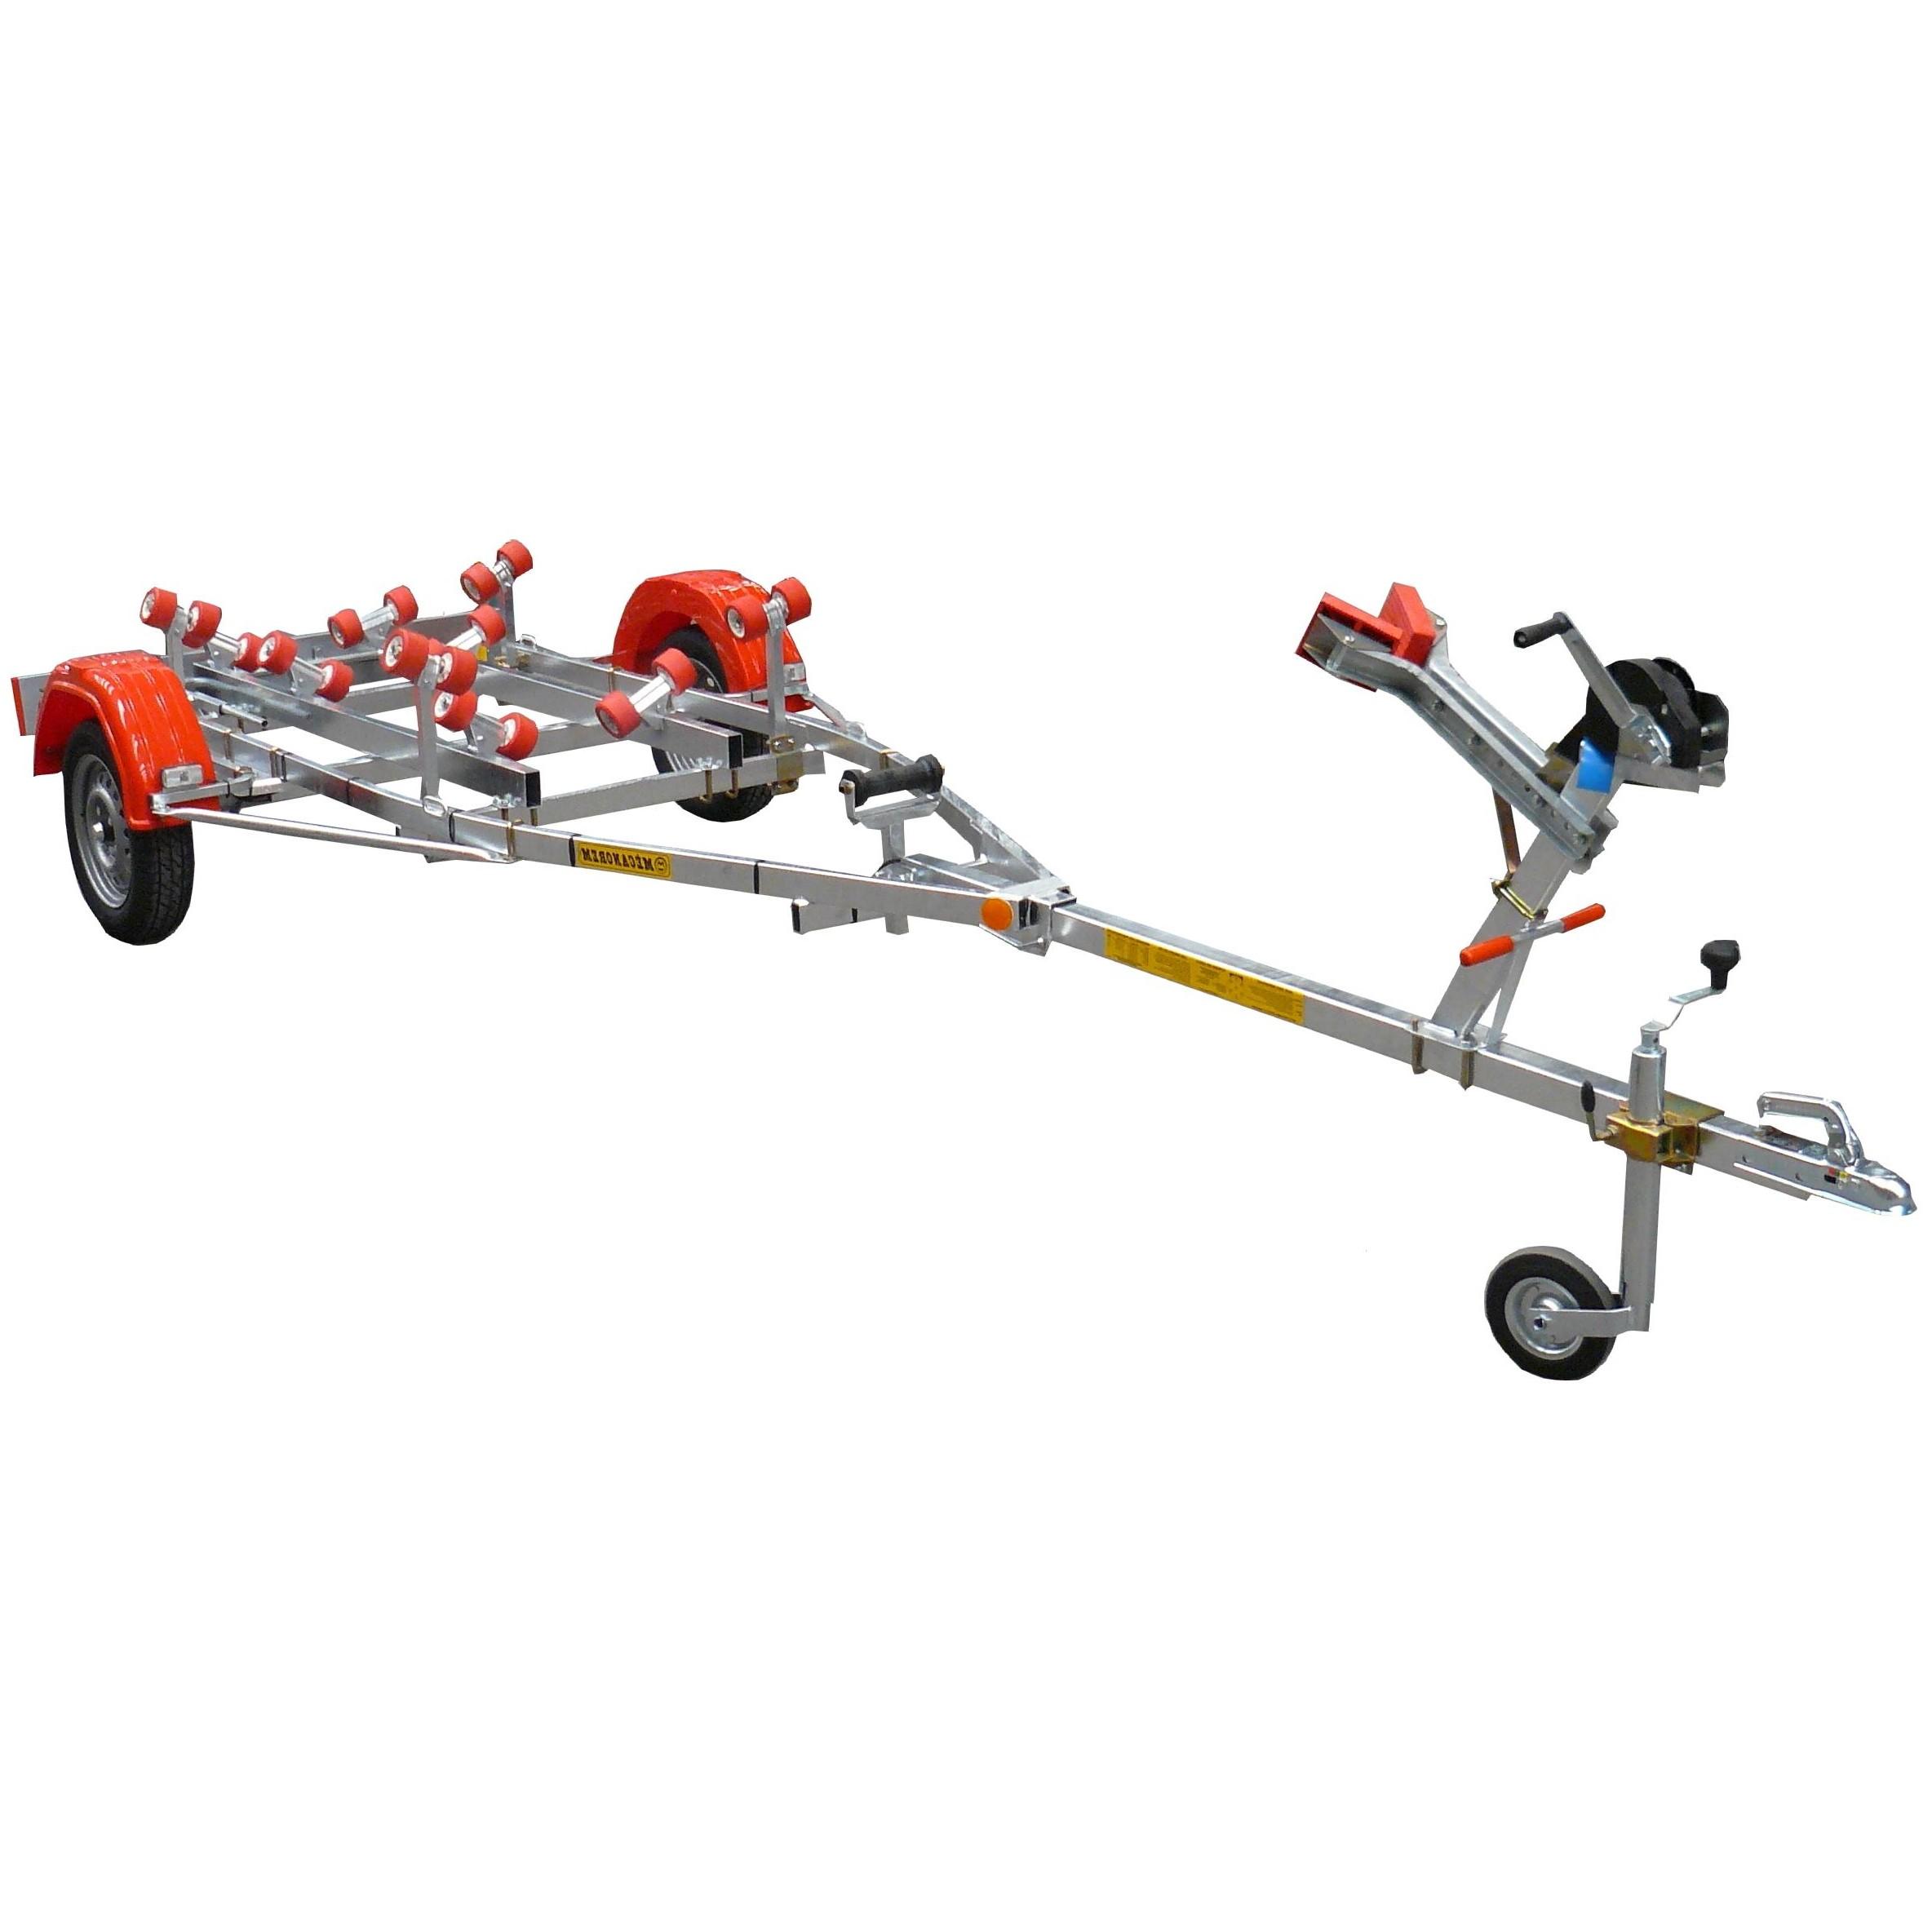 Remorque Bateau MTX 575 6.20m CU 550kg